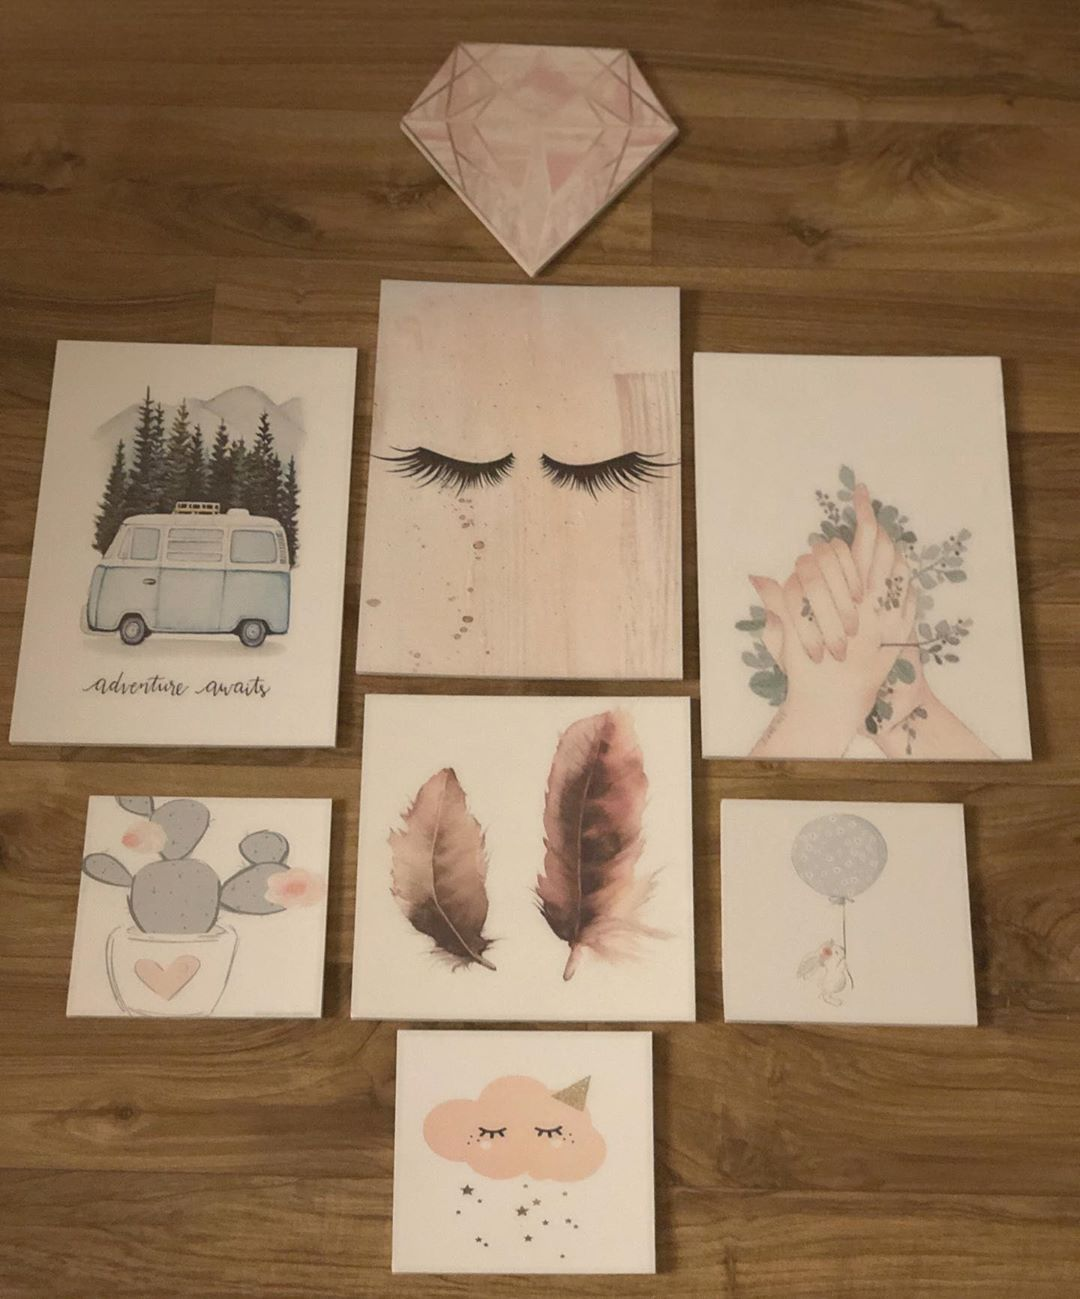 لوحات فلين On Instagram لوحات اكسبلور مشاهير فنانين فن ابداع لوحات فلين لوحات جدارية Flower Background Wallpaper Emoji Wallpaper Iphone Wallpaper